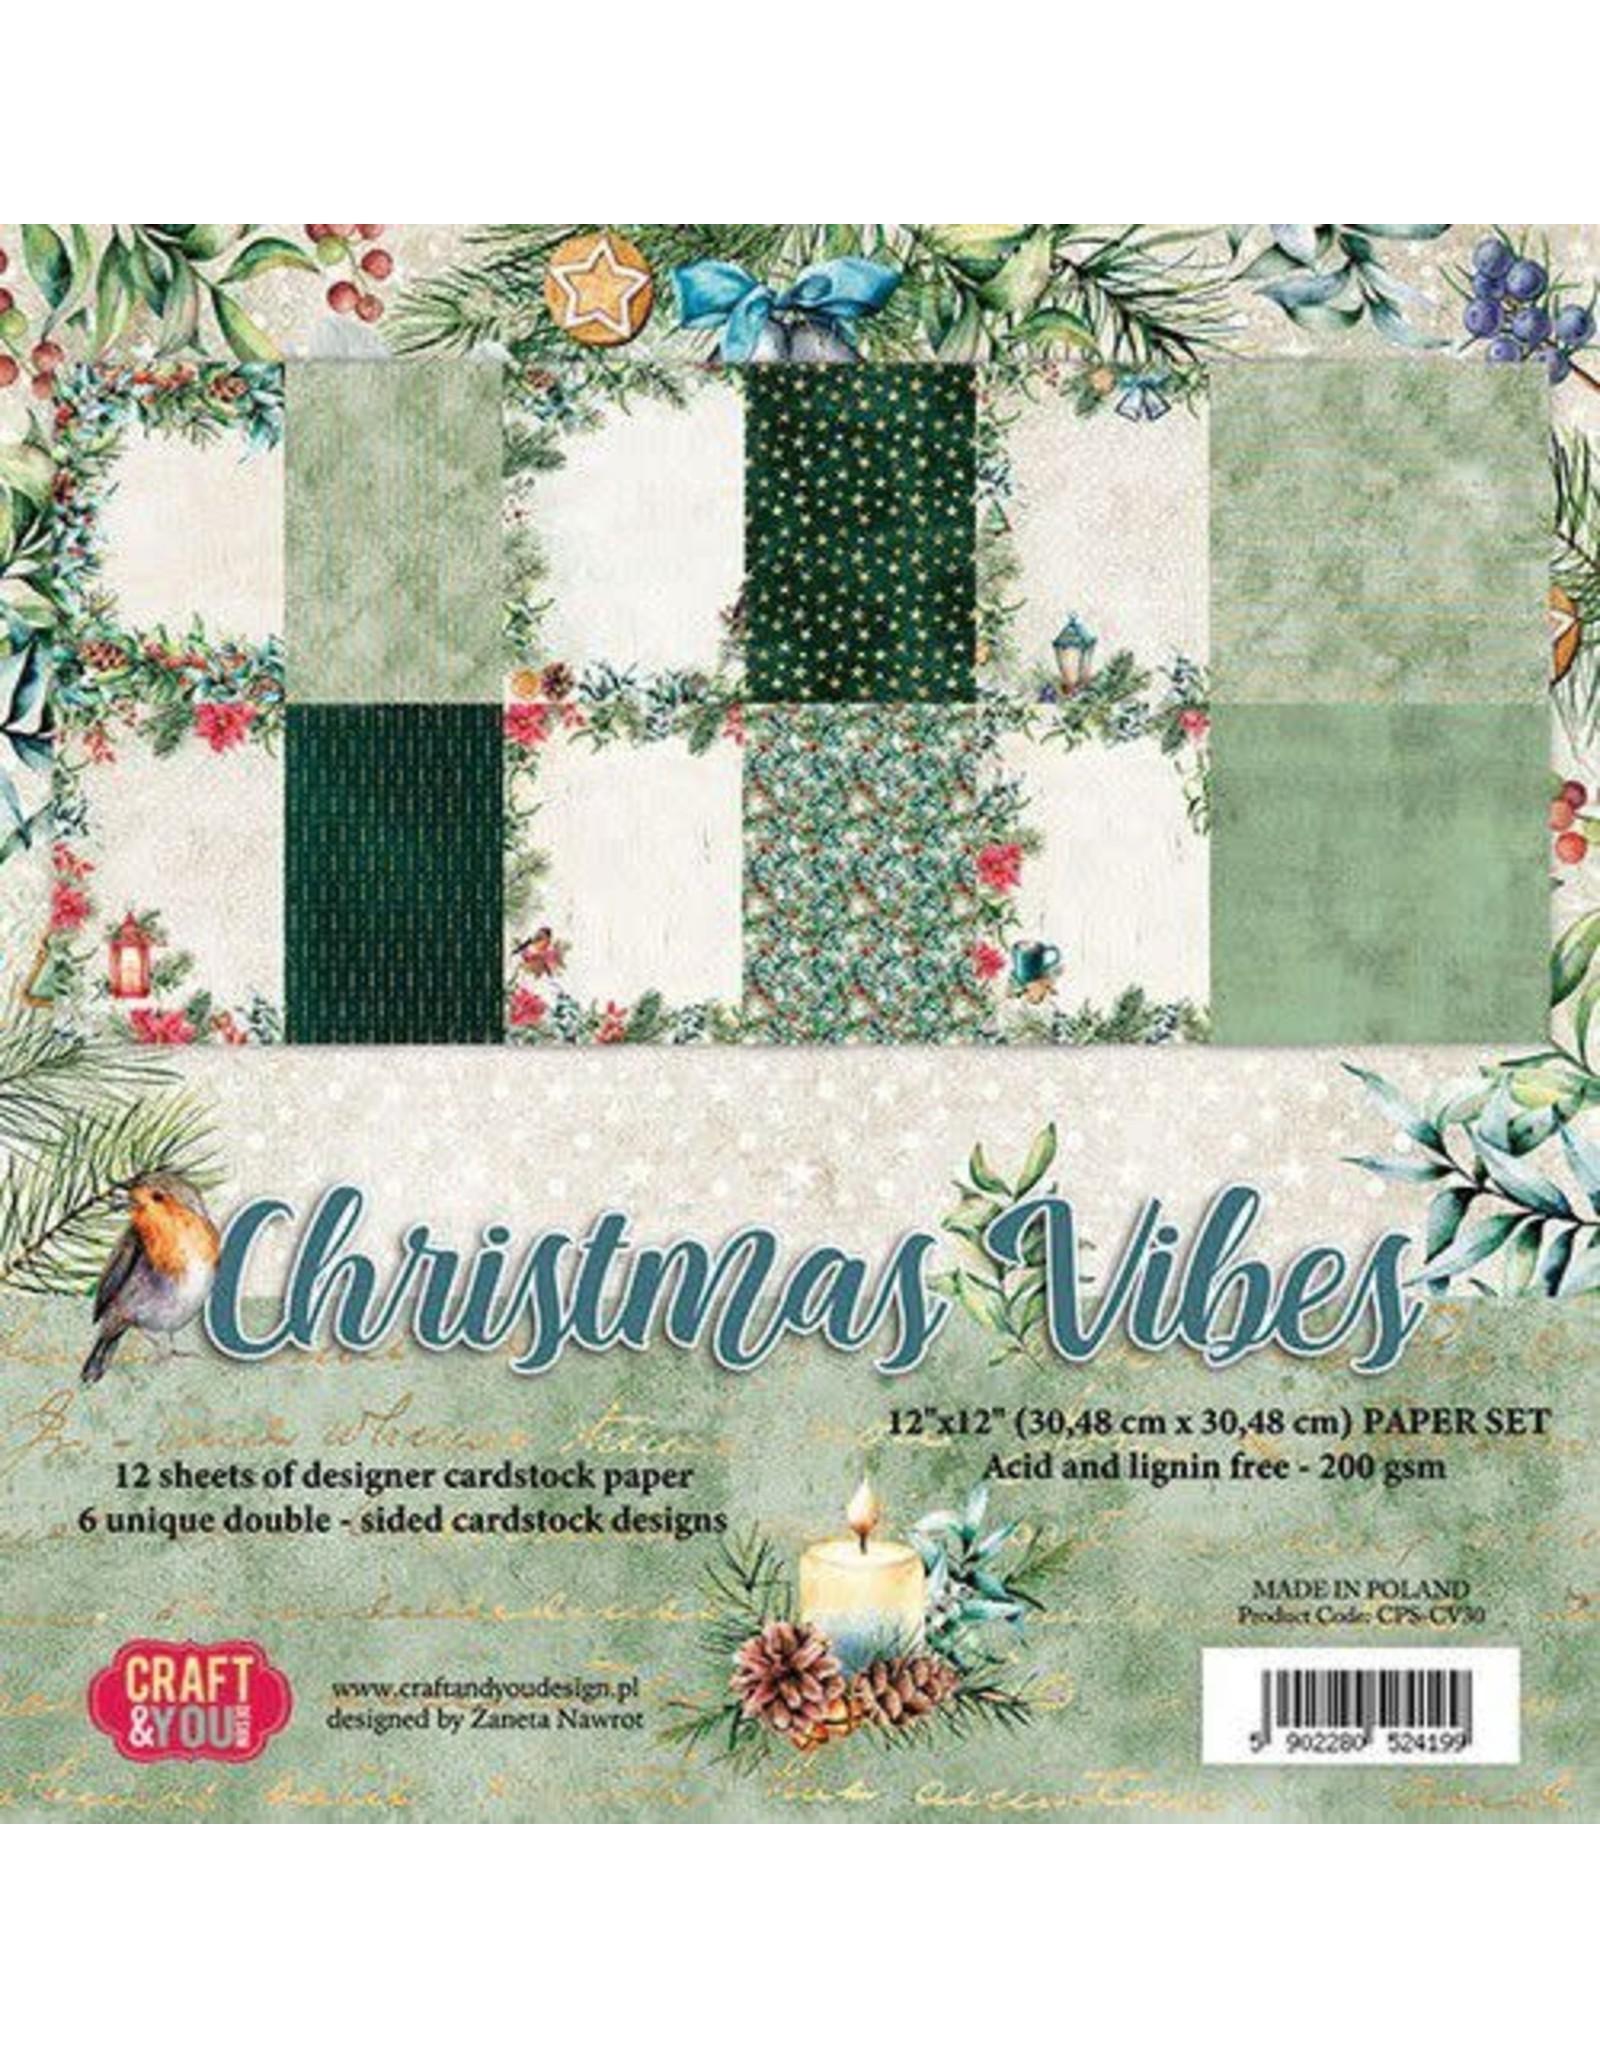 Craft & You Craft&You Christmas Vibes BIG Paper Set 12x12 12 vel CPS-CV30